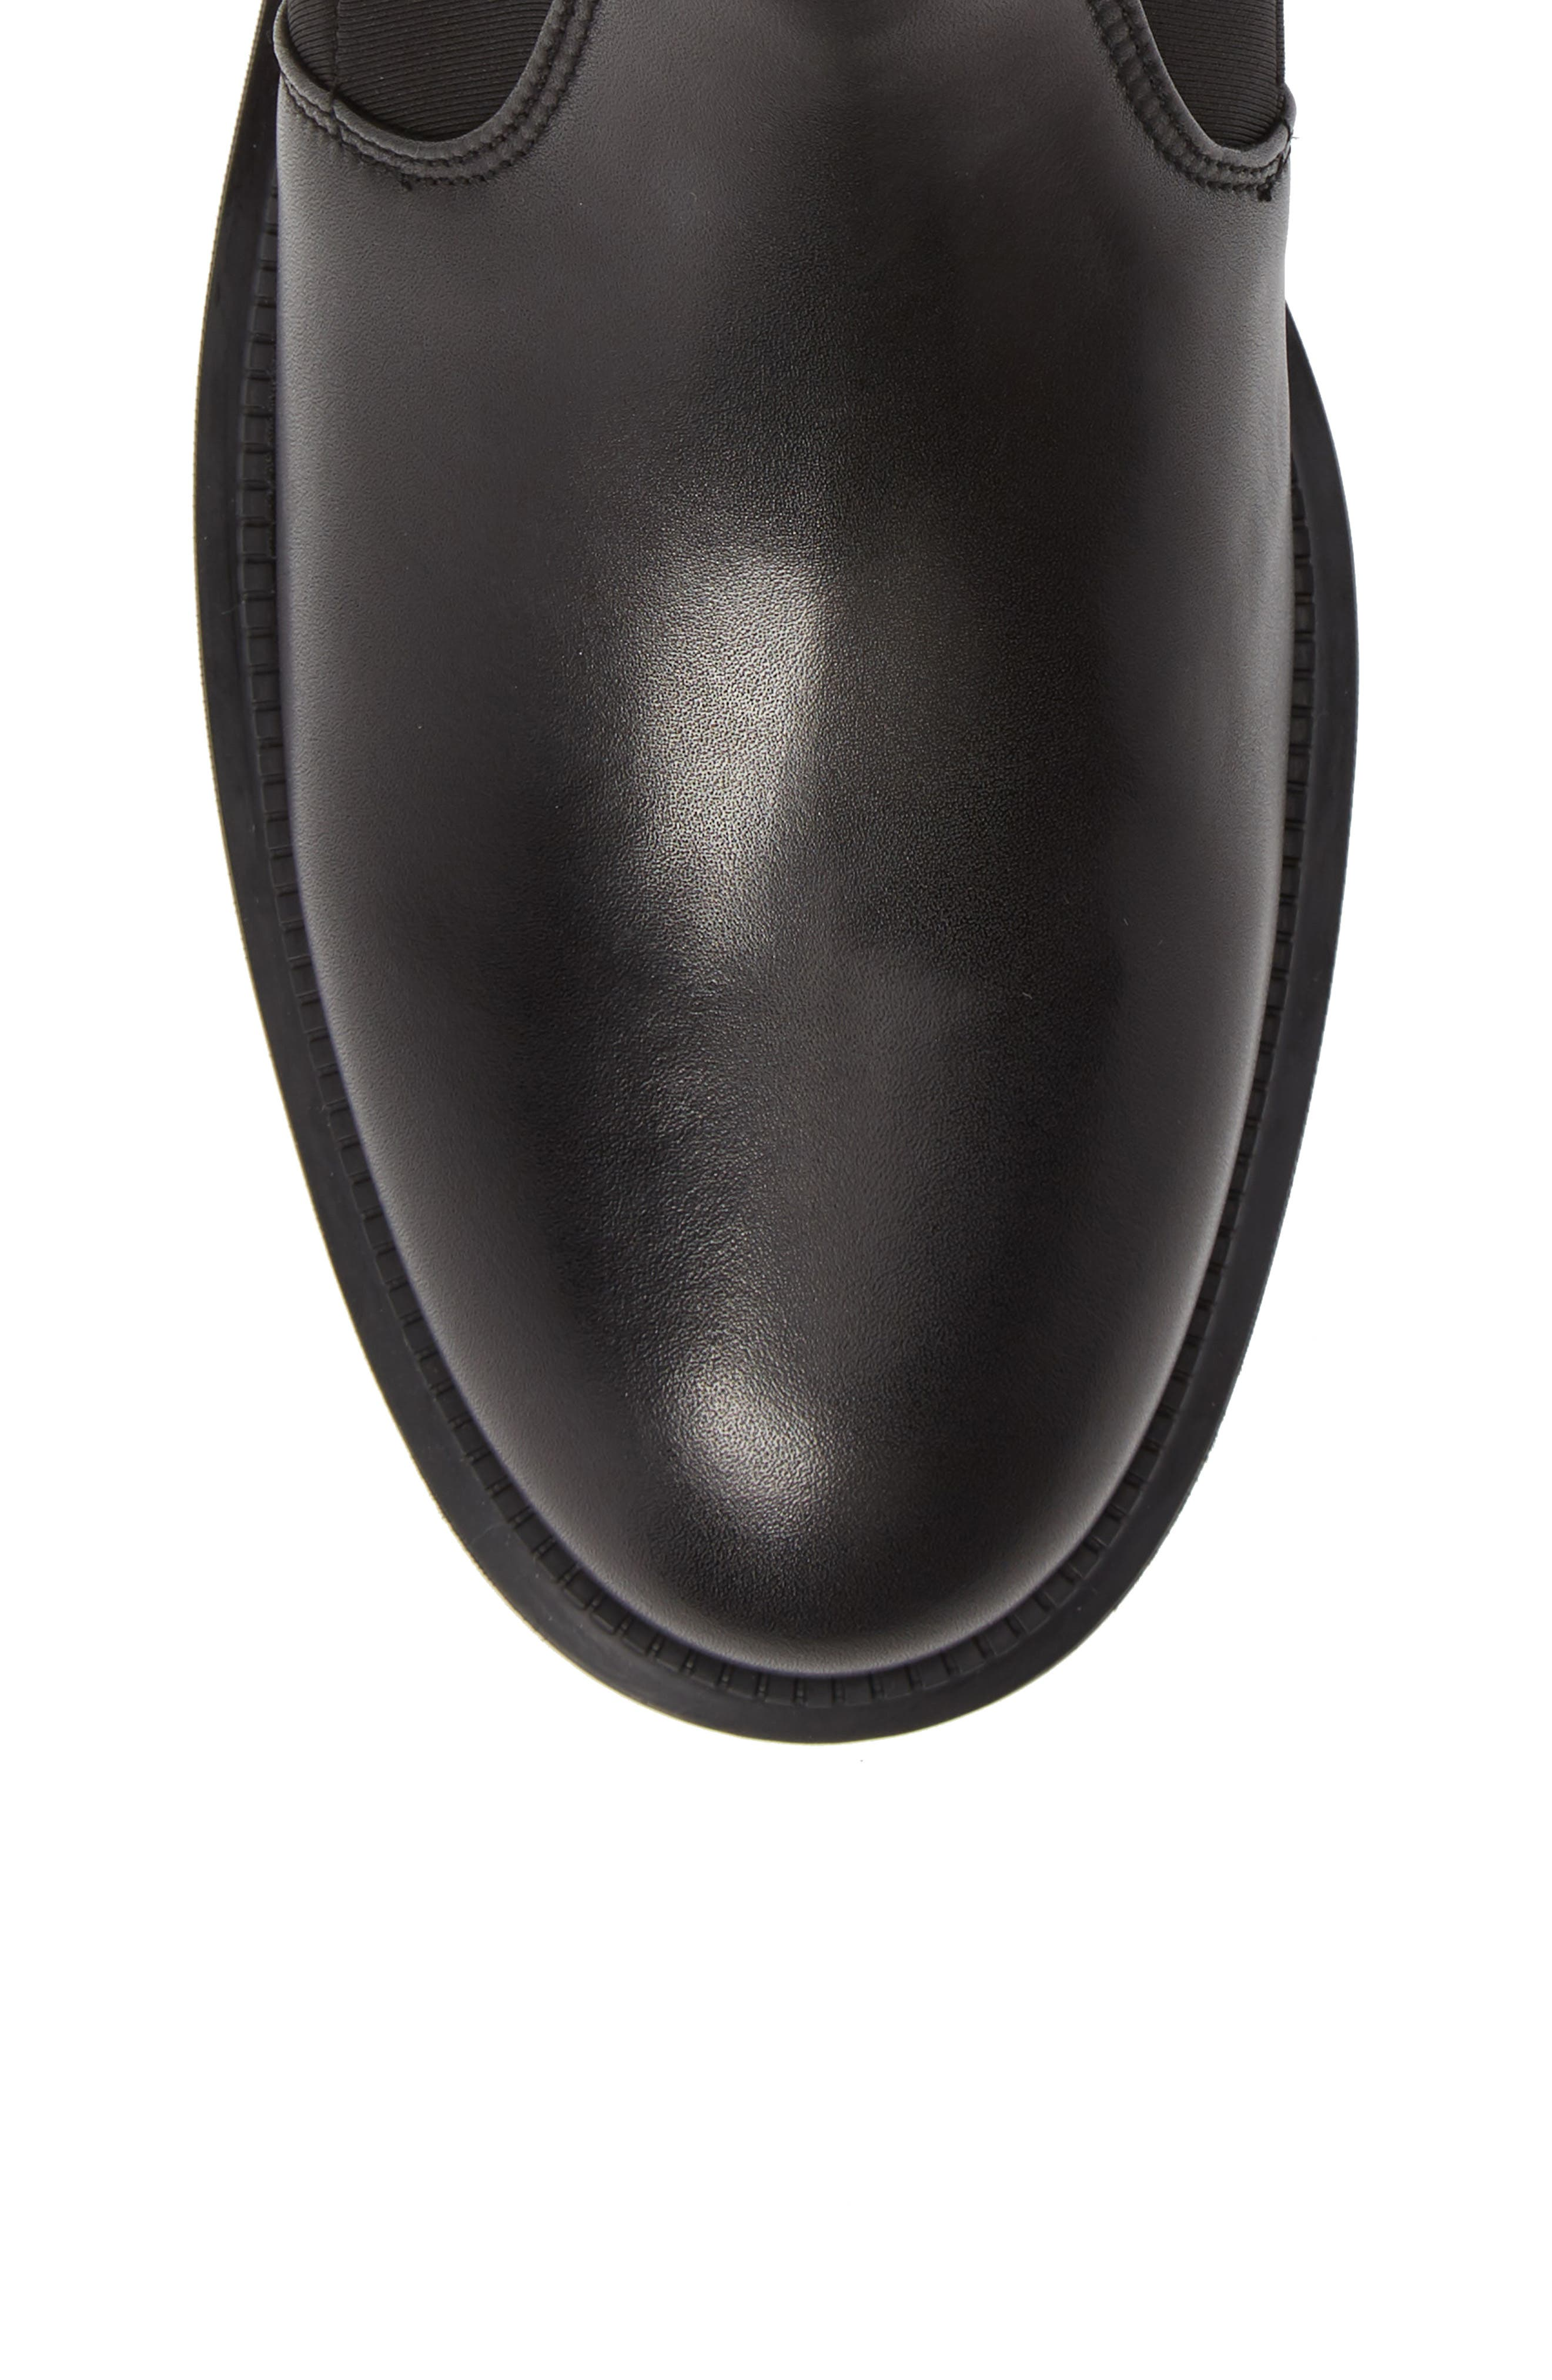 Leoda Ankle Boot,                             Alternate thumbnail 5, color,                             BLACK